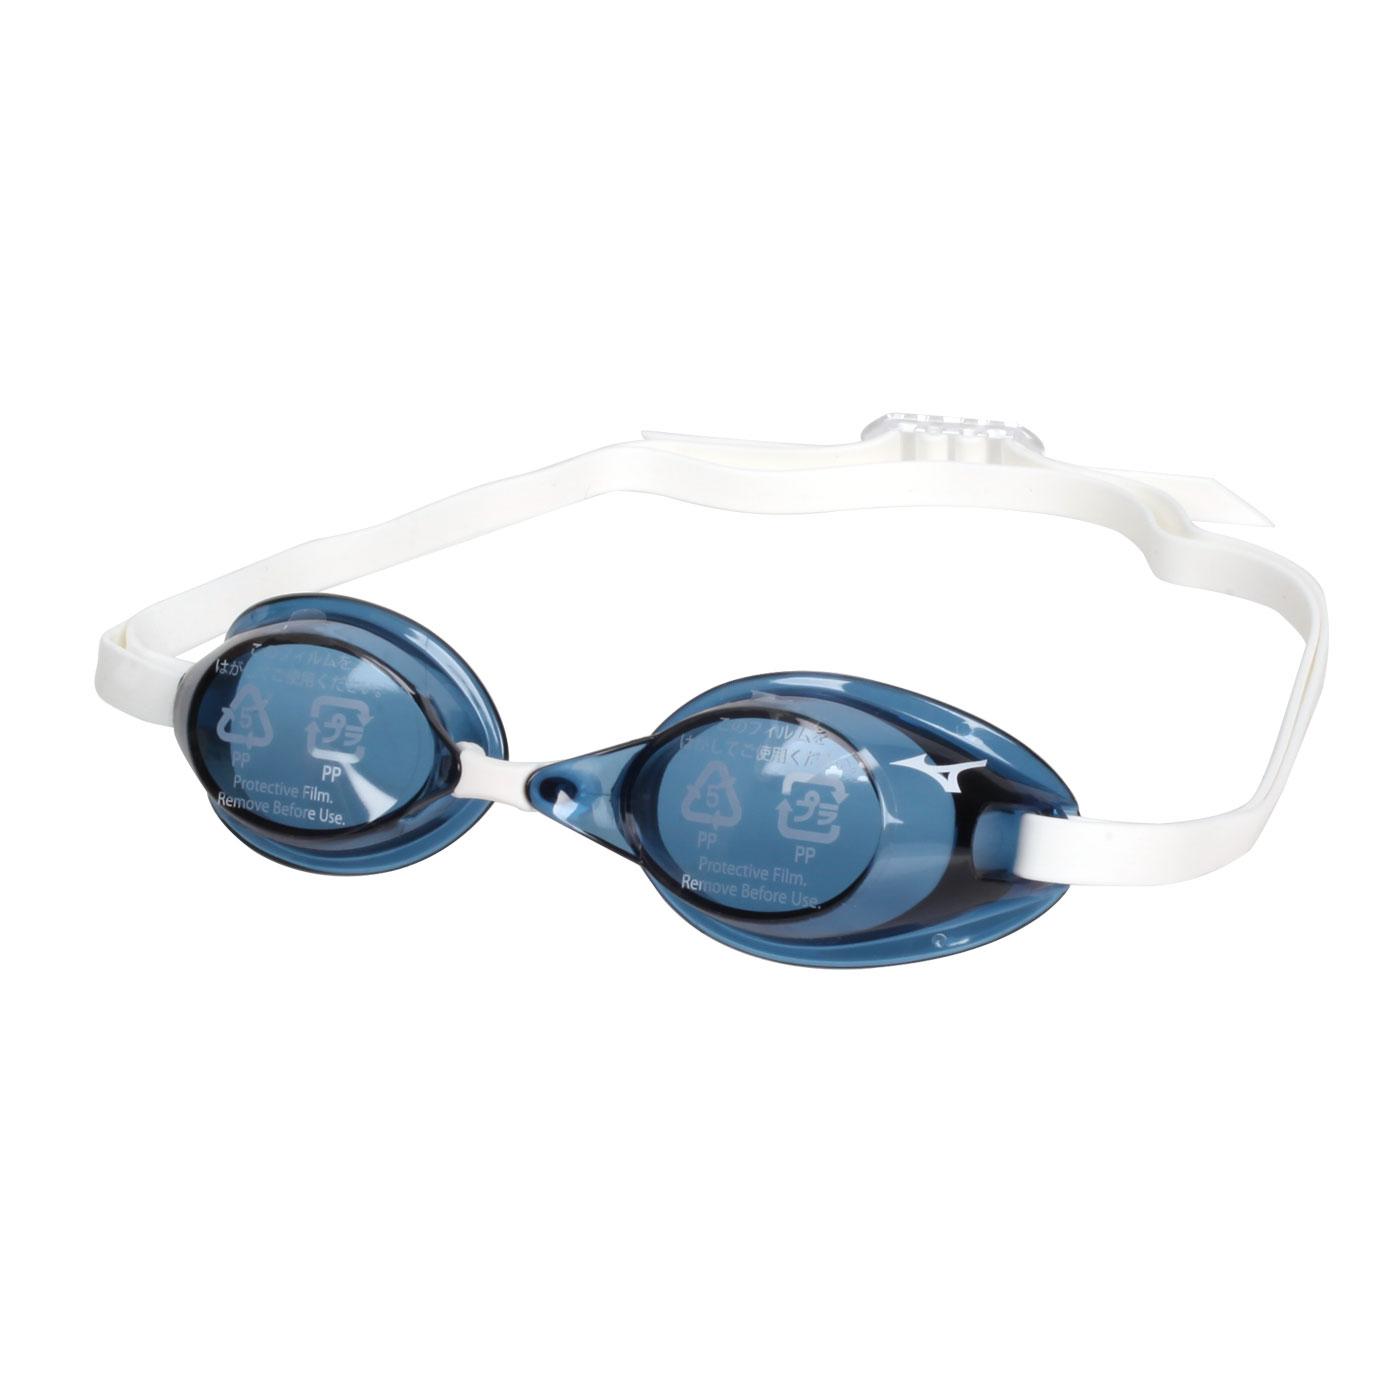 MIZUNO 泳鏡  SWIM85YA-75000-12 - 藍黑白